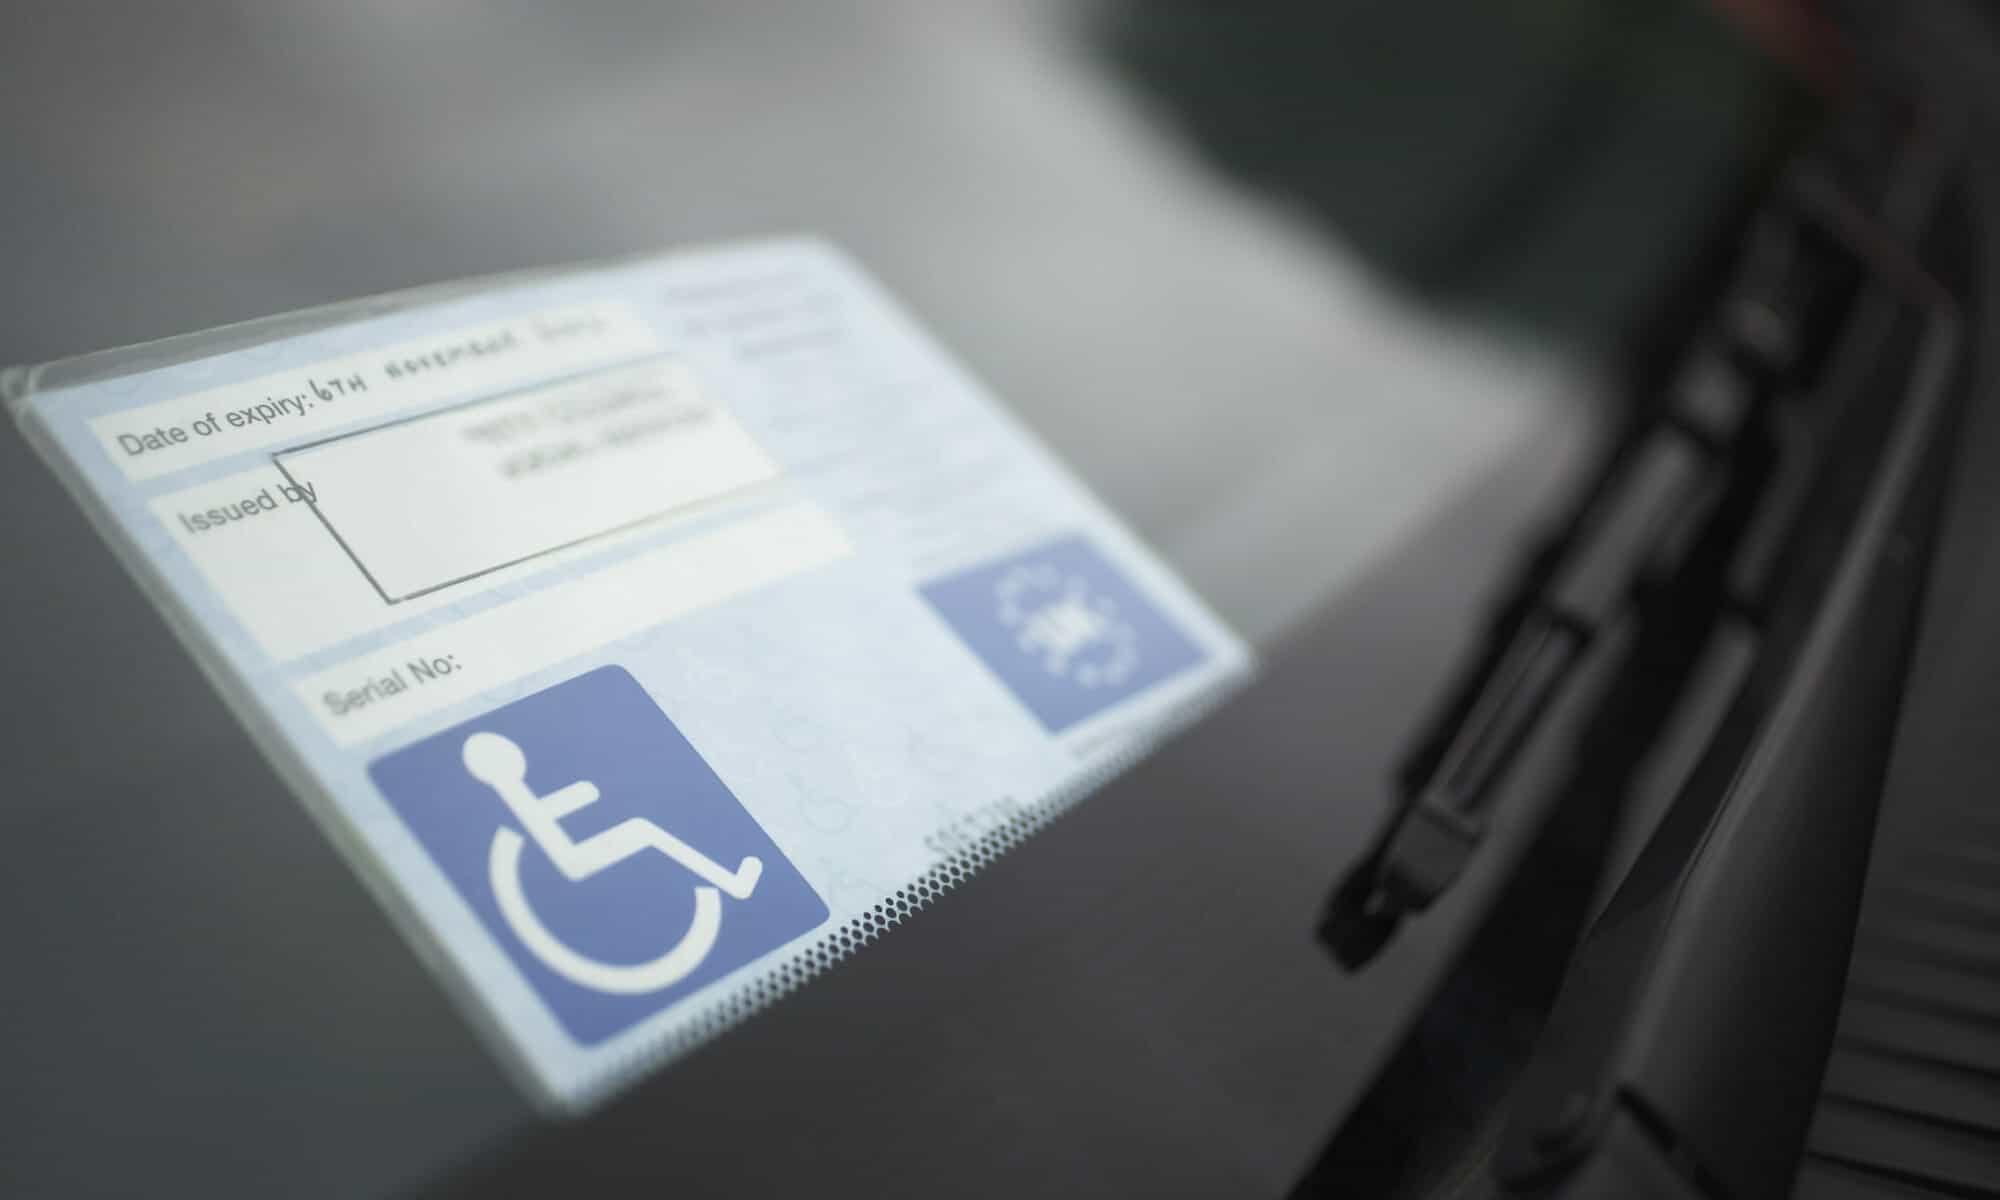 Parkausweis nach Paragraph 29b STVO